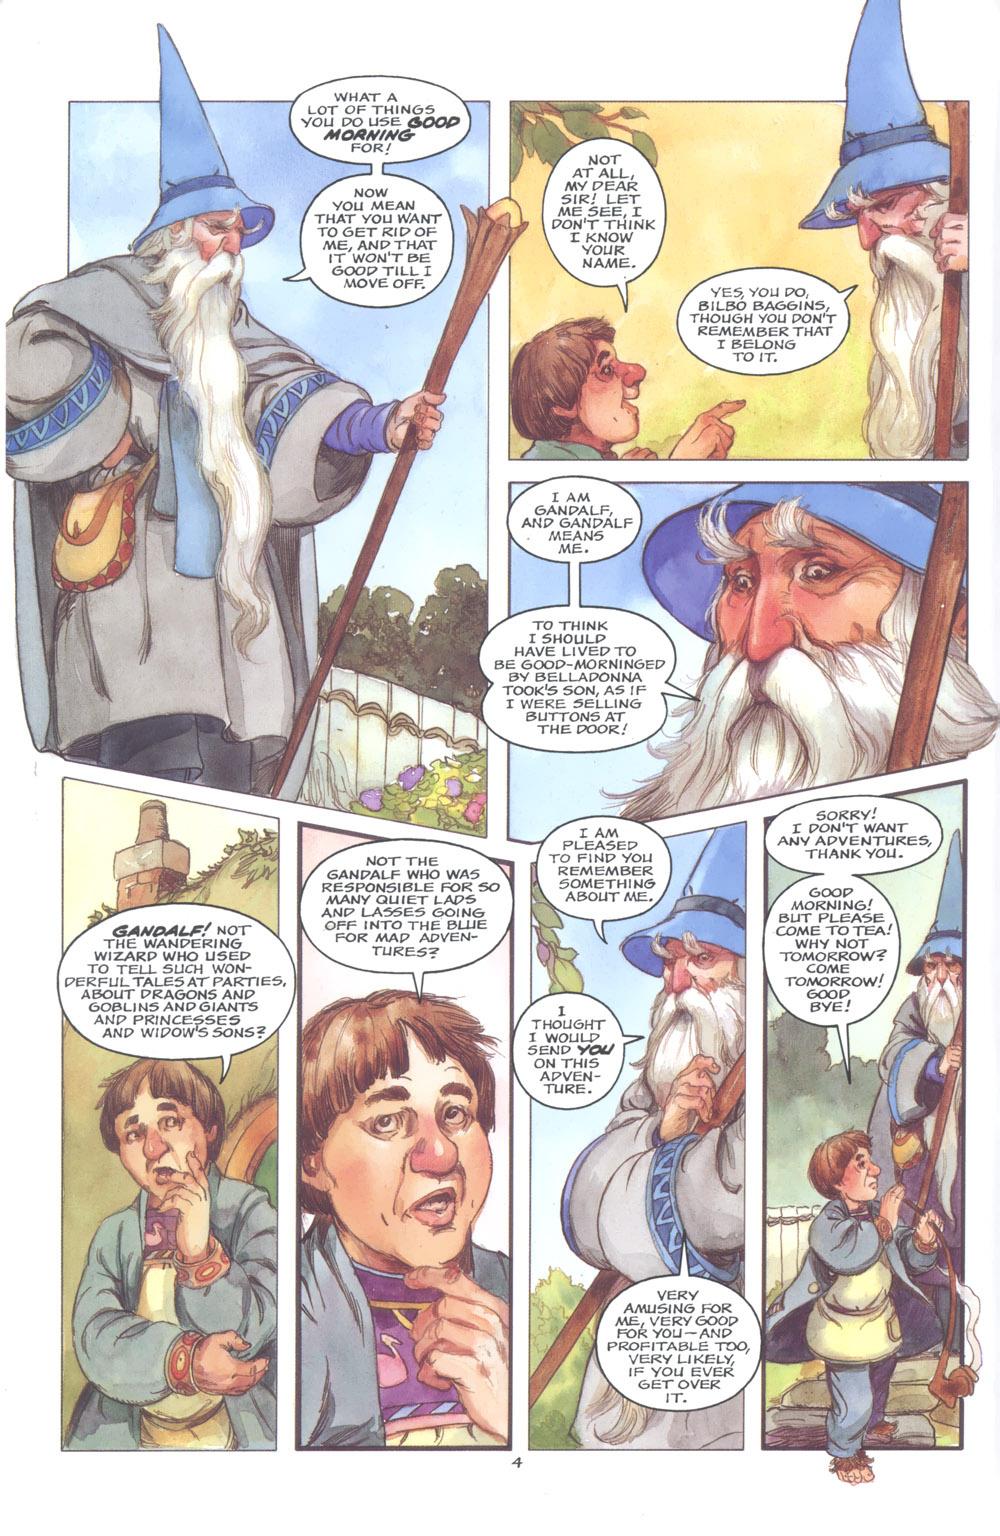 David Monogram. The hobbit 004